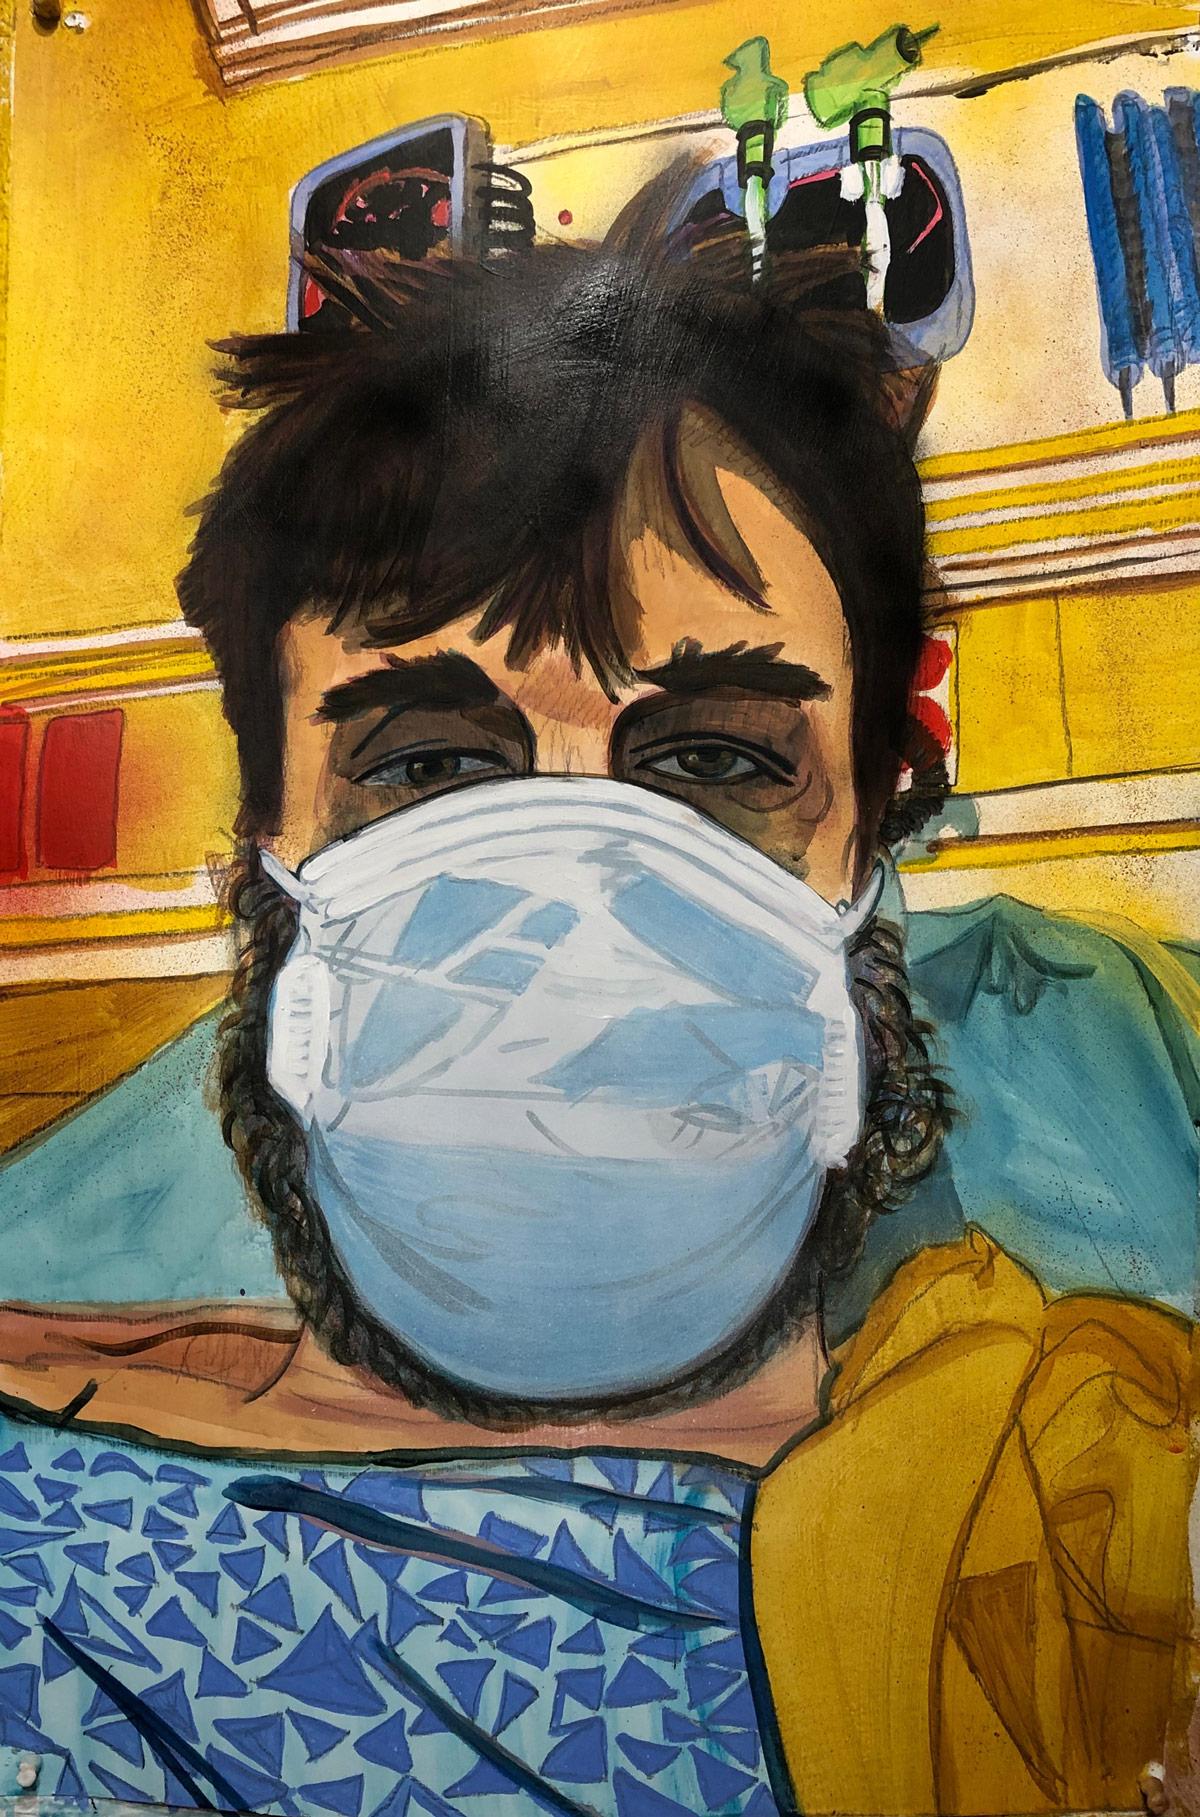 Tristan Duke, artist Los Angeles CA, 2020